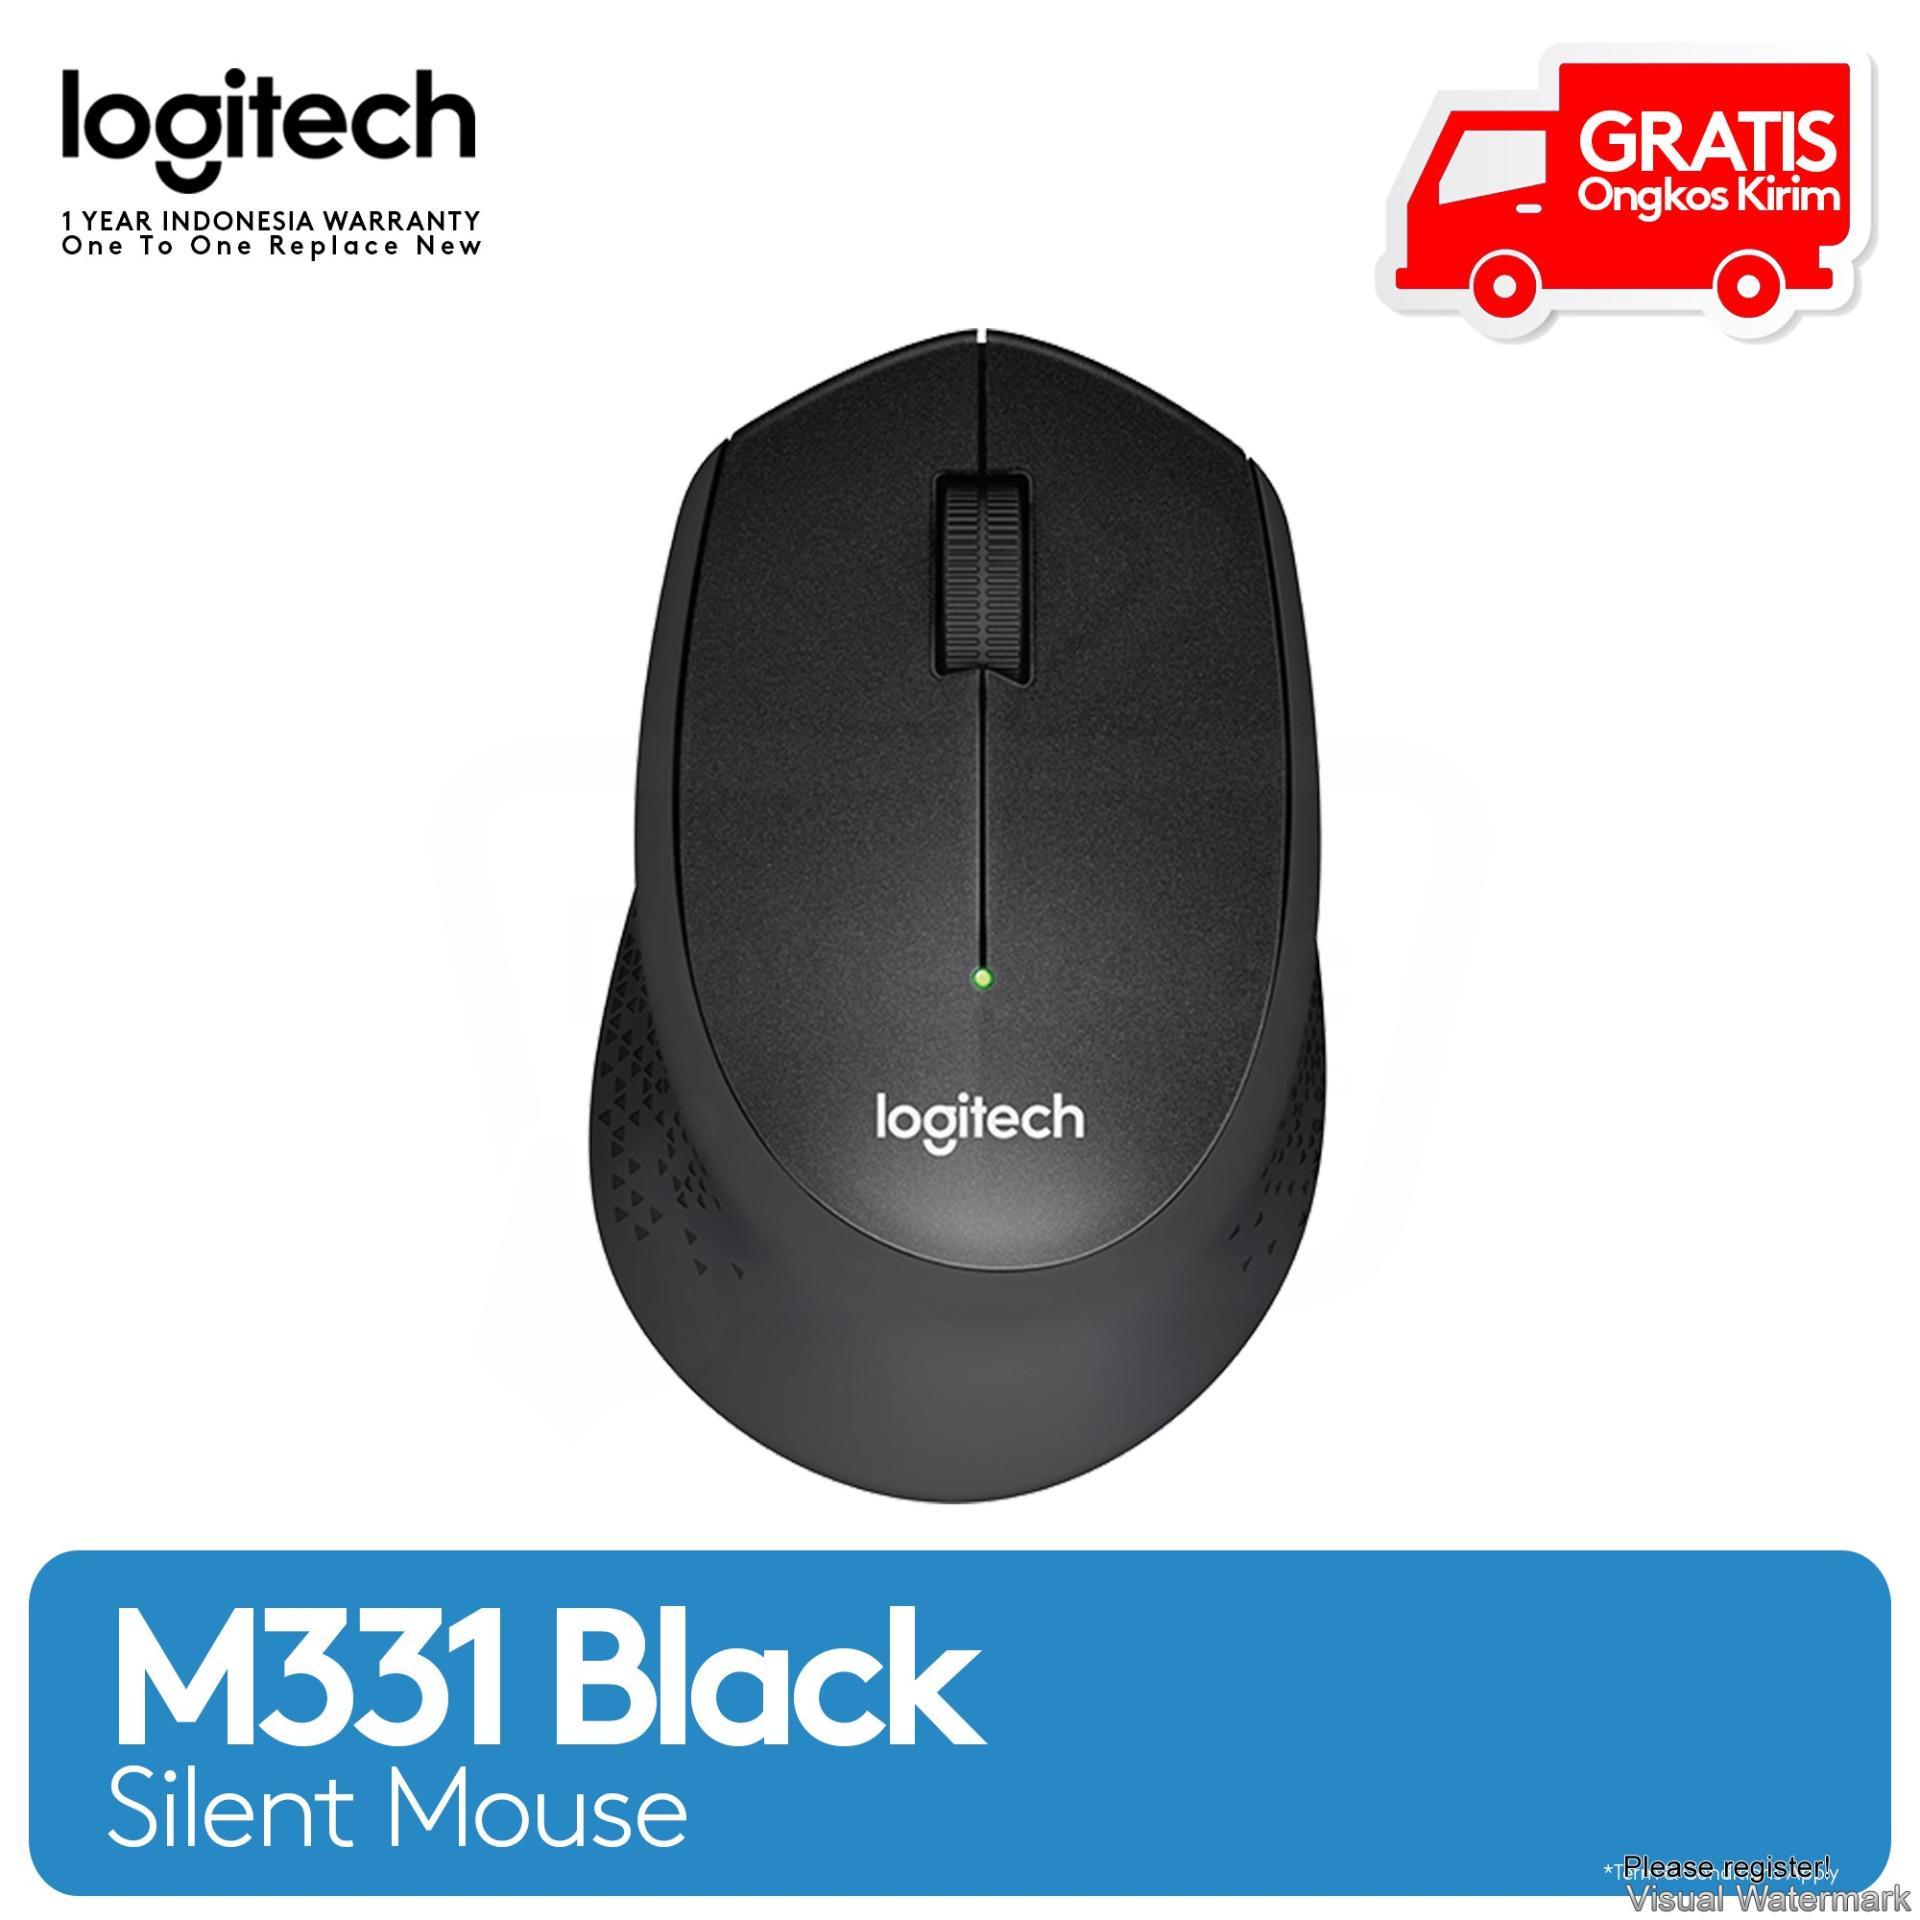 Logitech M331 Silent Wireless Mouse - Hitam